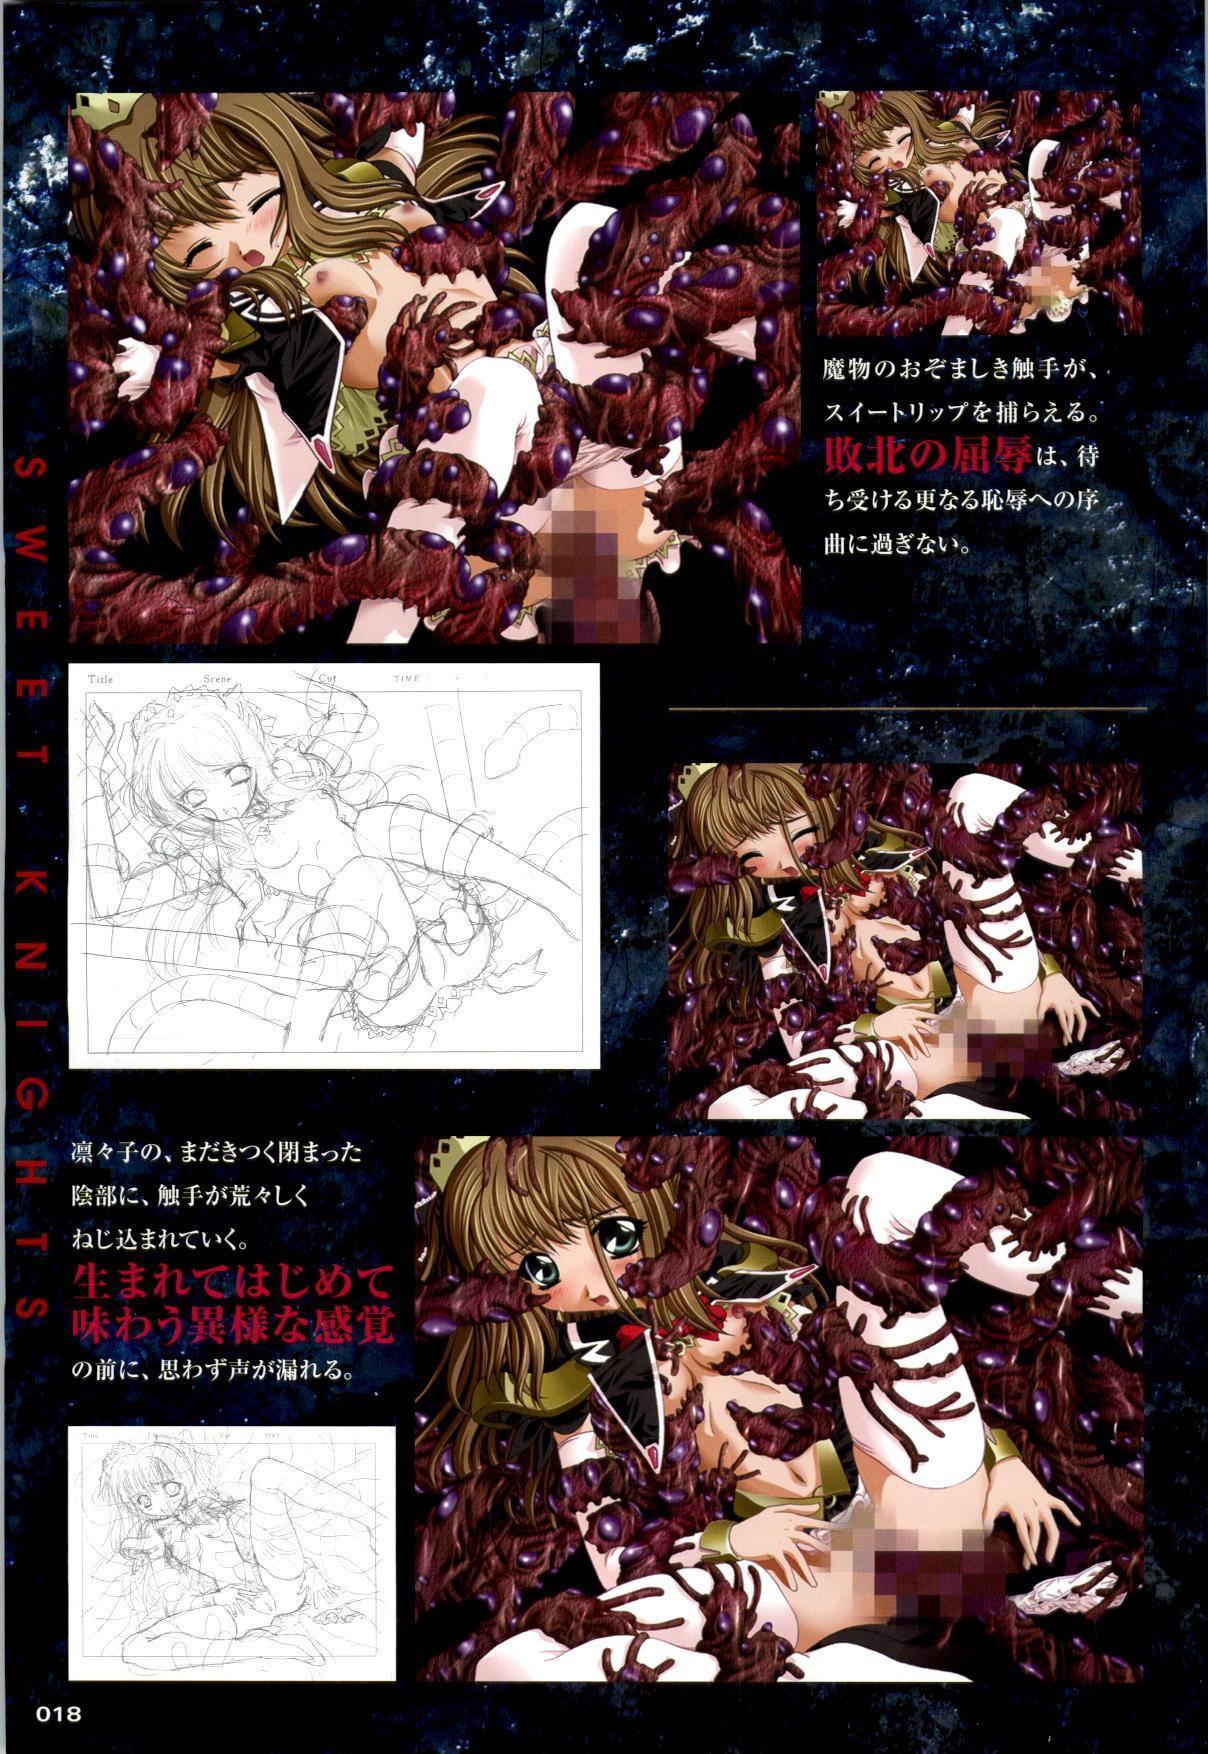 Mahou Senshi Sweet Knight & Mahou Senshi Princess Tear 17